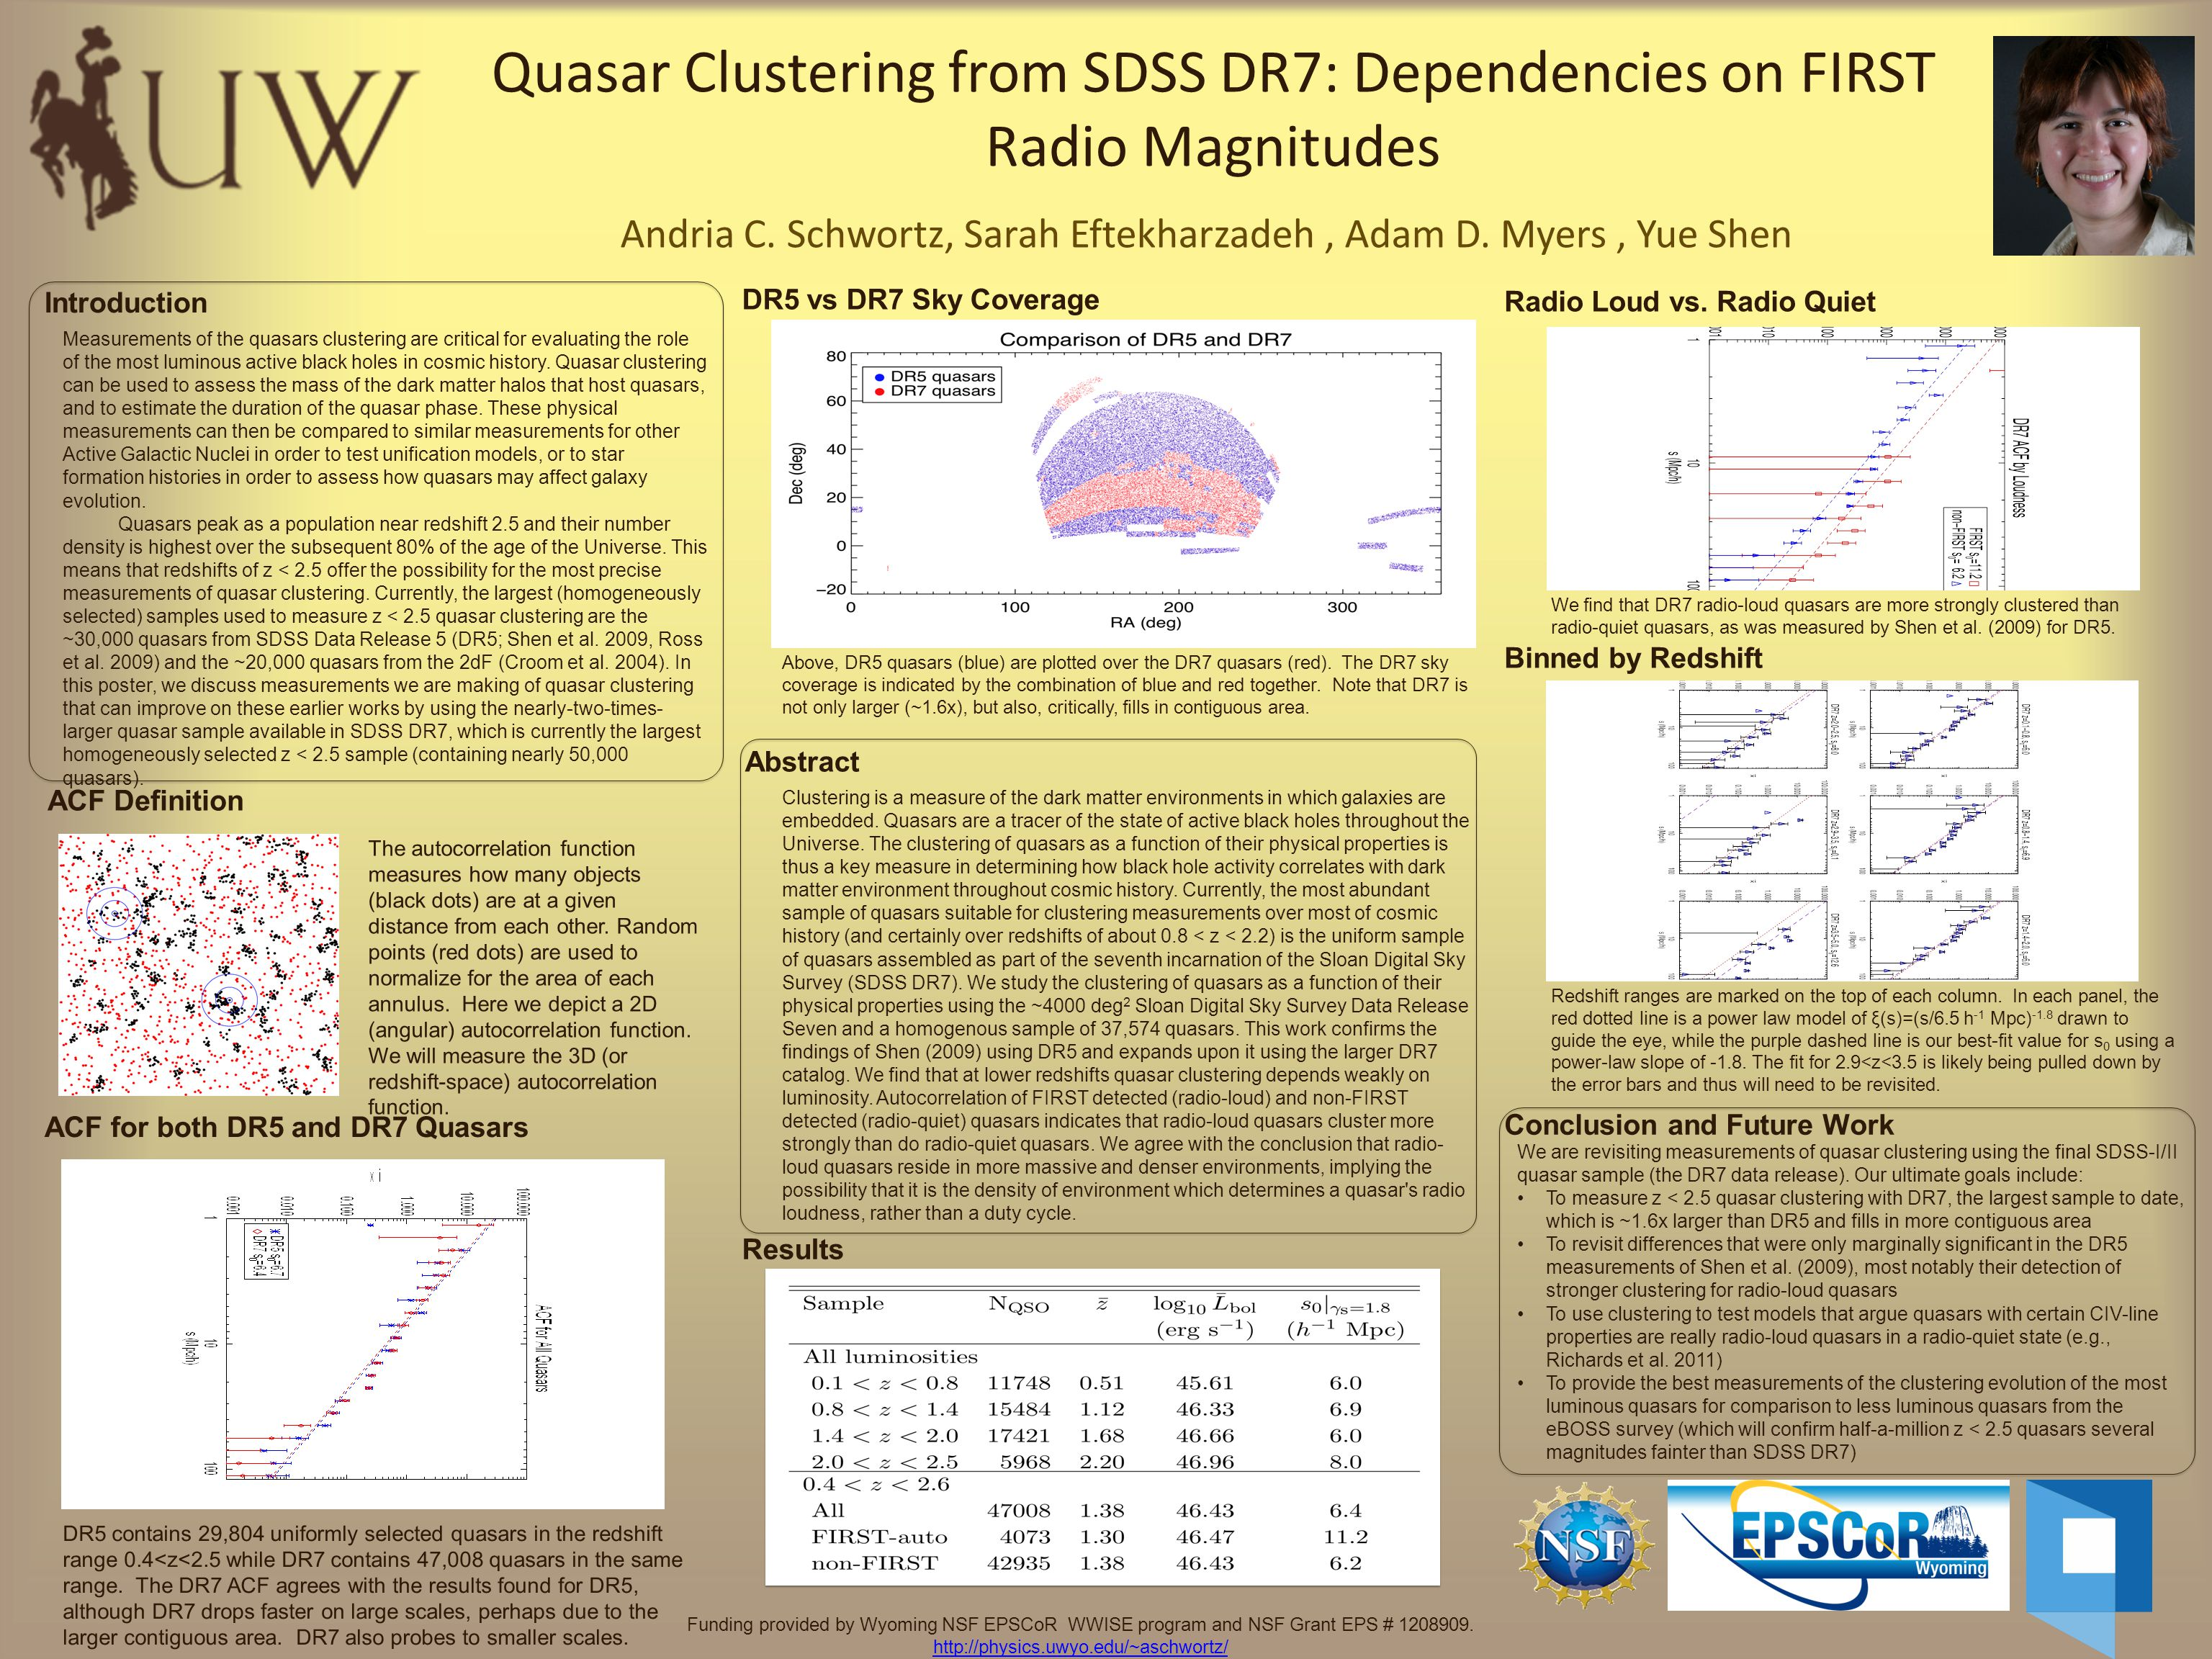 Quasar Clustering from SDSS DR7: Dependencies on FIRST Radio Magnitudes Andria C. Schwortz, Sarah Eftekharzadeh, Adam D. Myers, Yue Shen Clustering is